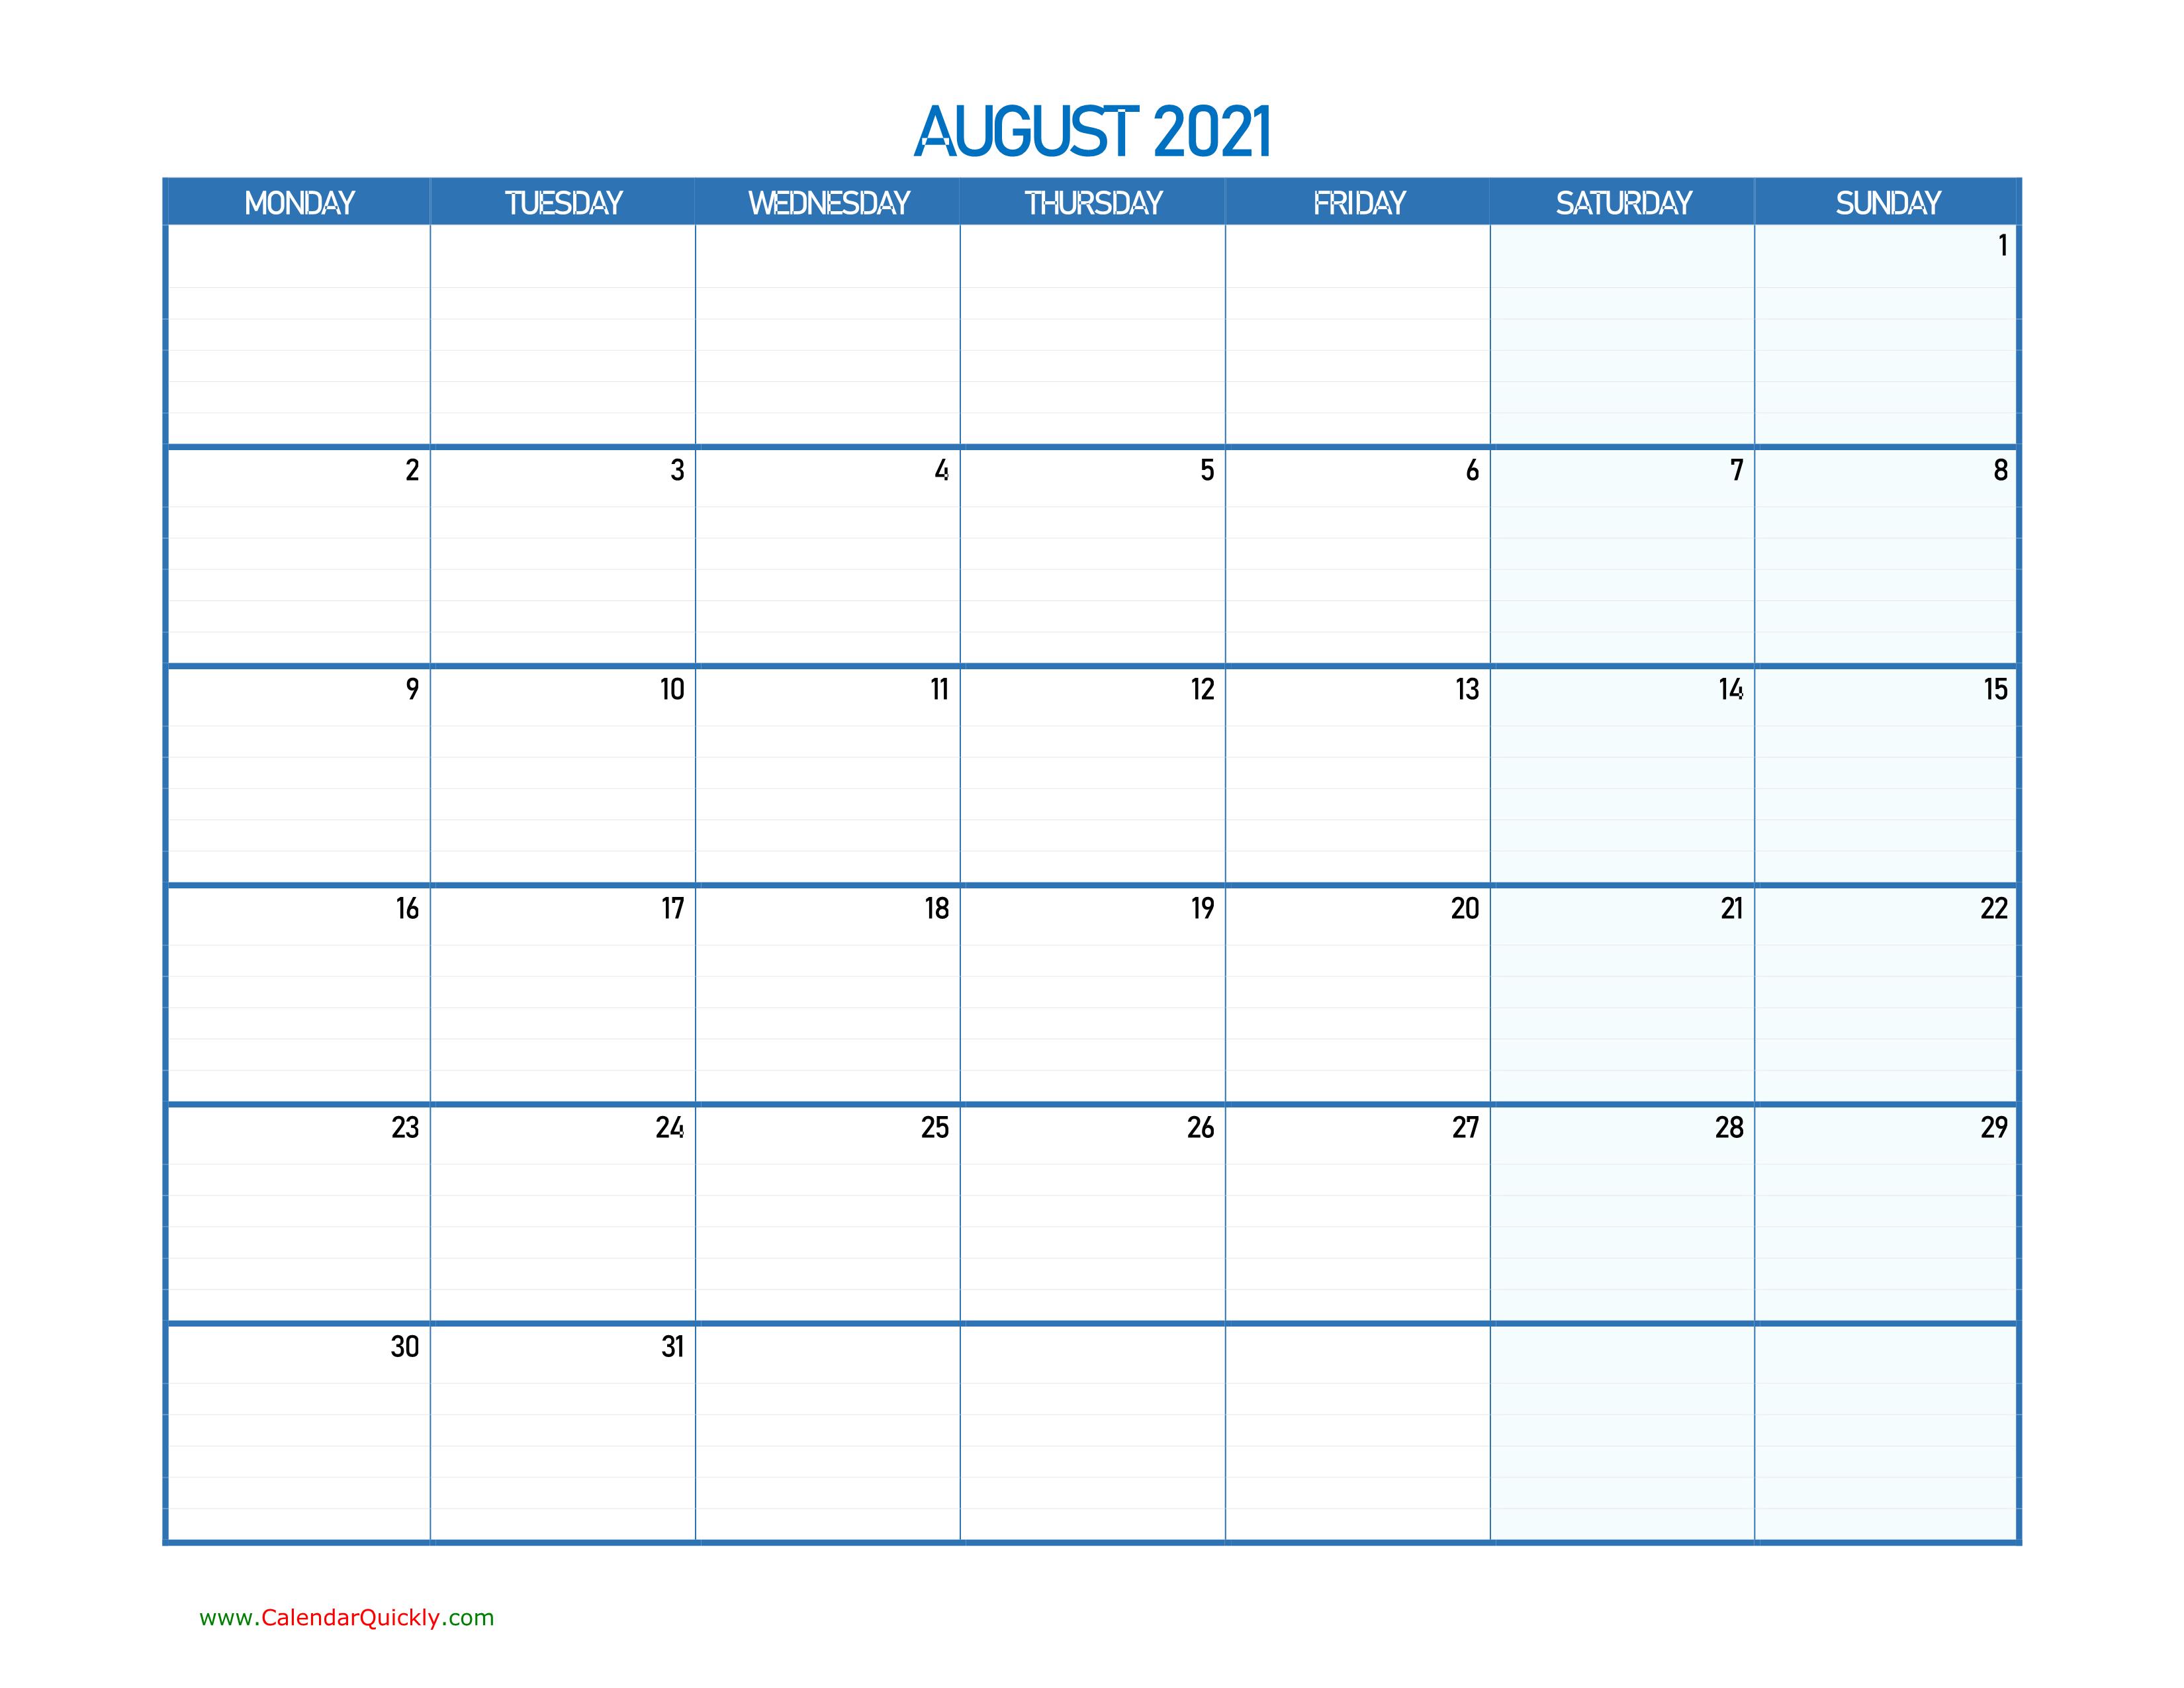 August Monday 2021 Blank Calendar   Calendar Quickly